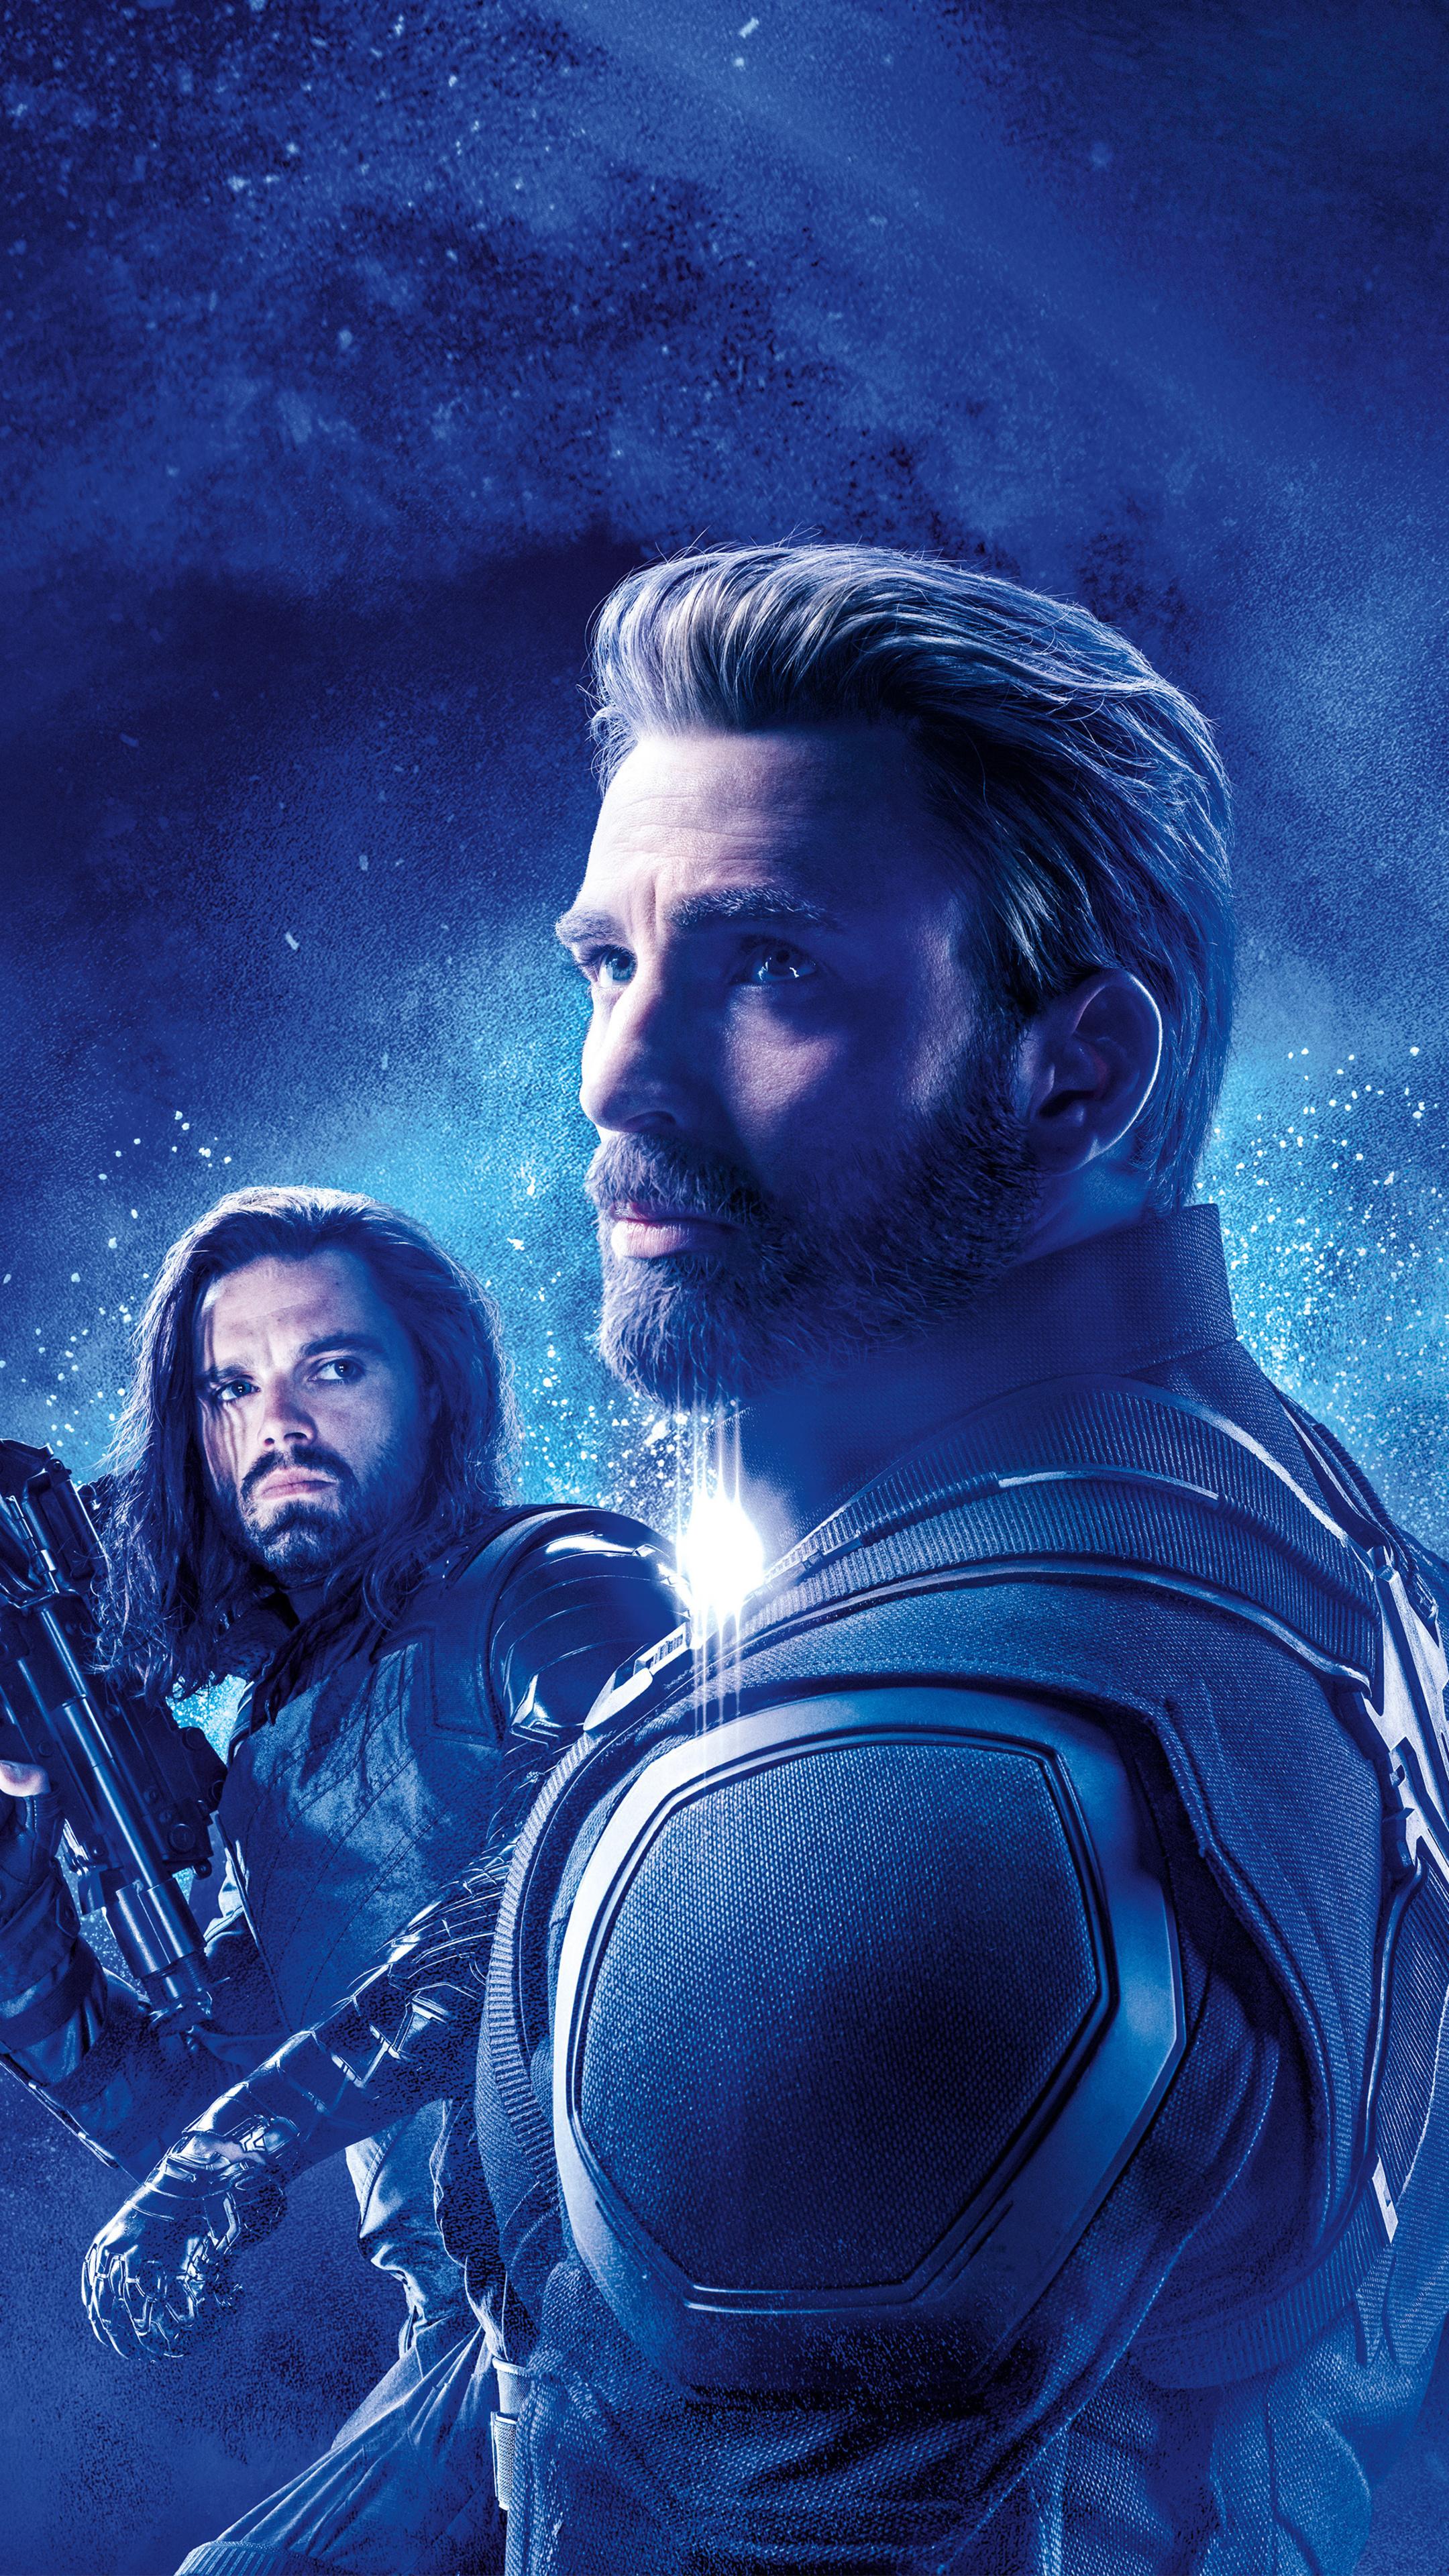 avengers-infinity-war-space-stone-5k-ce.jpg